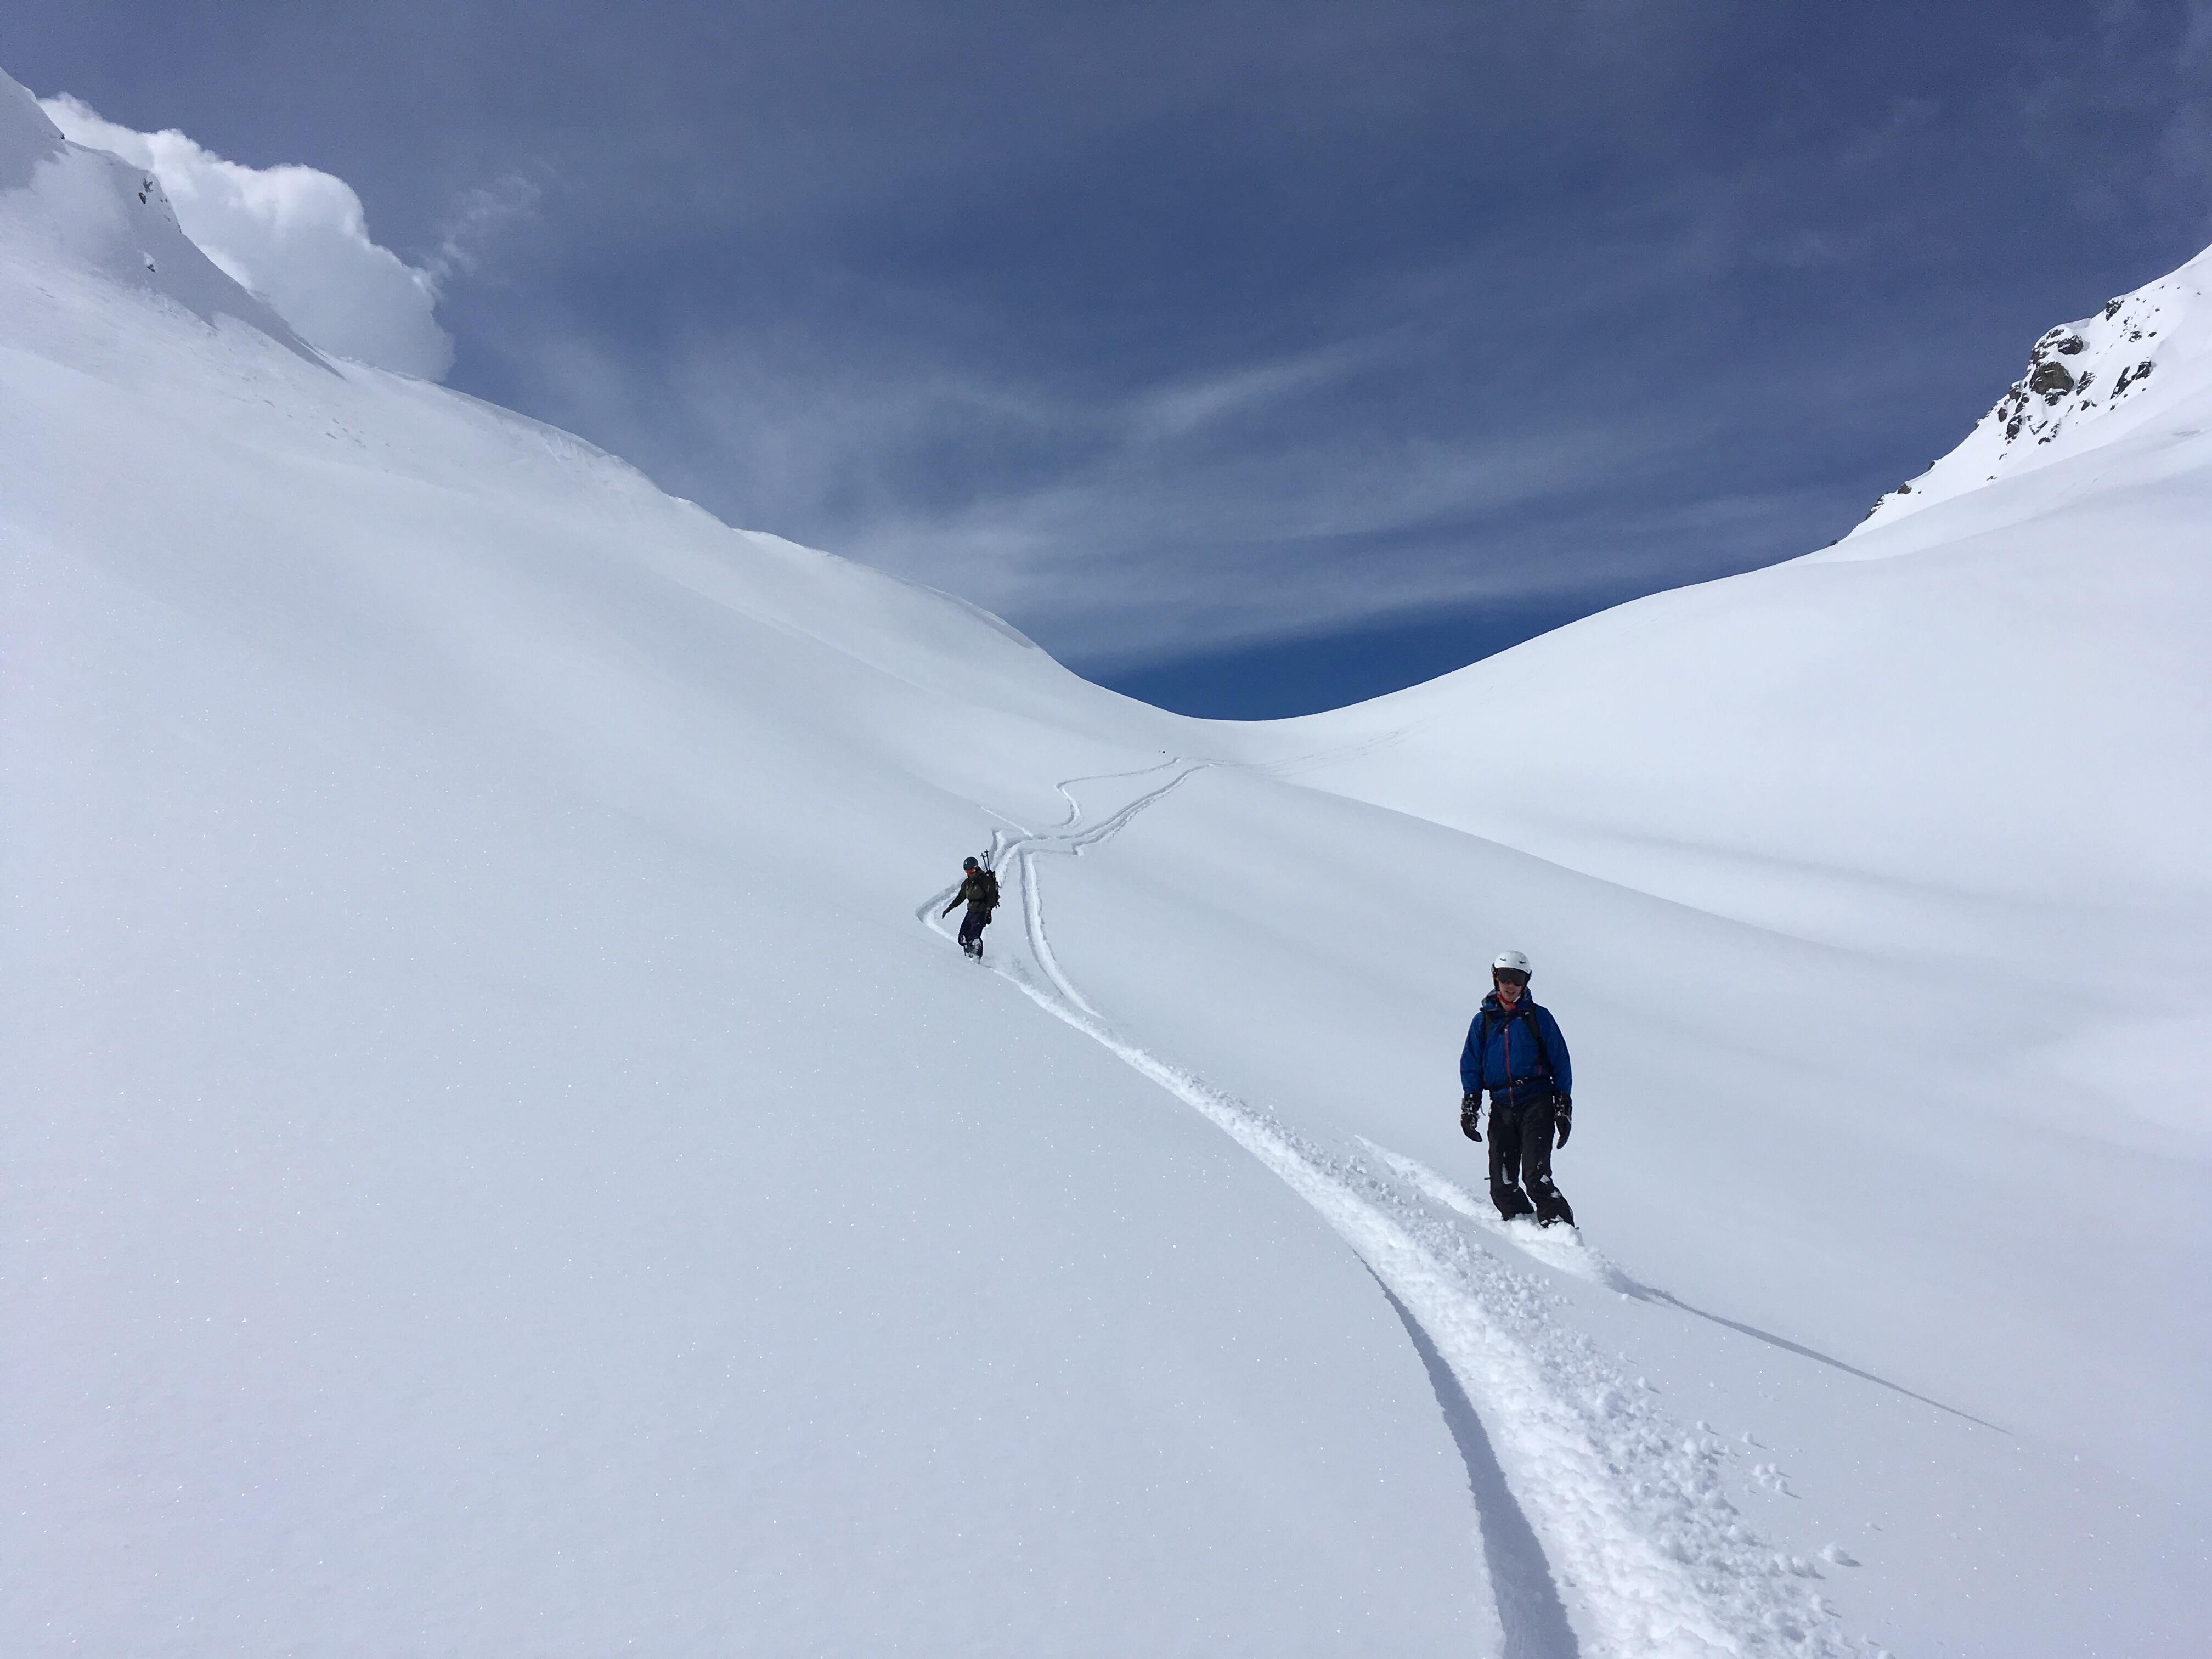 Col de la Louze snowboard 6